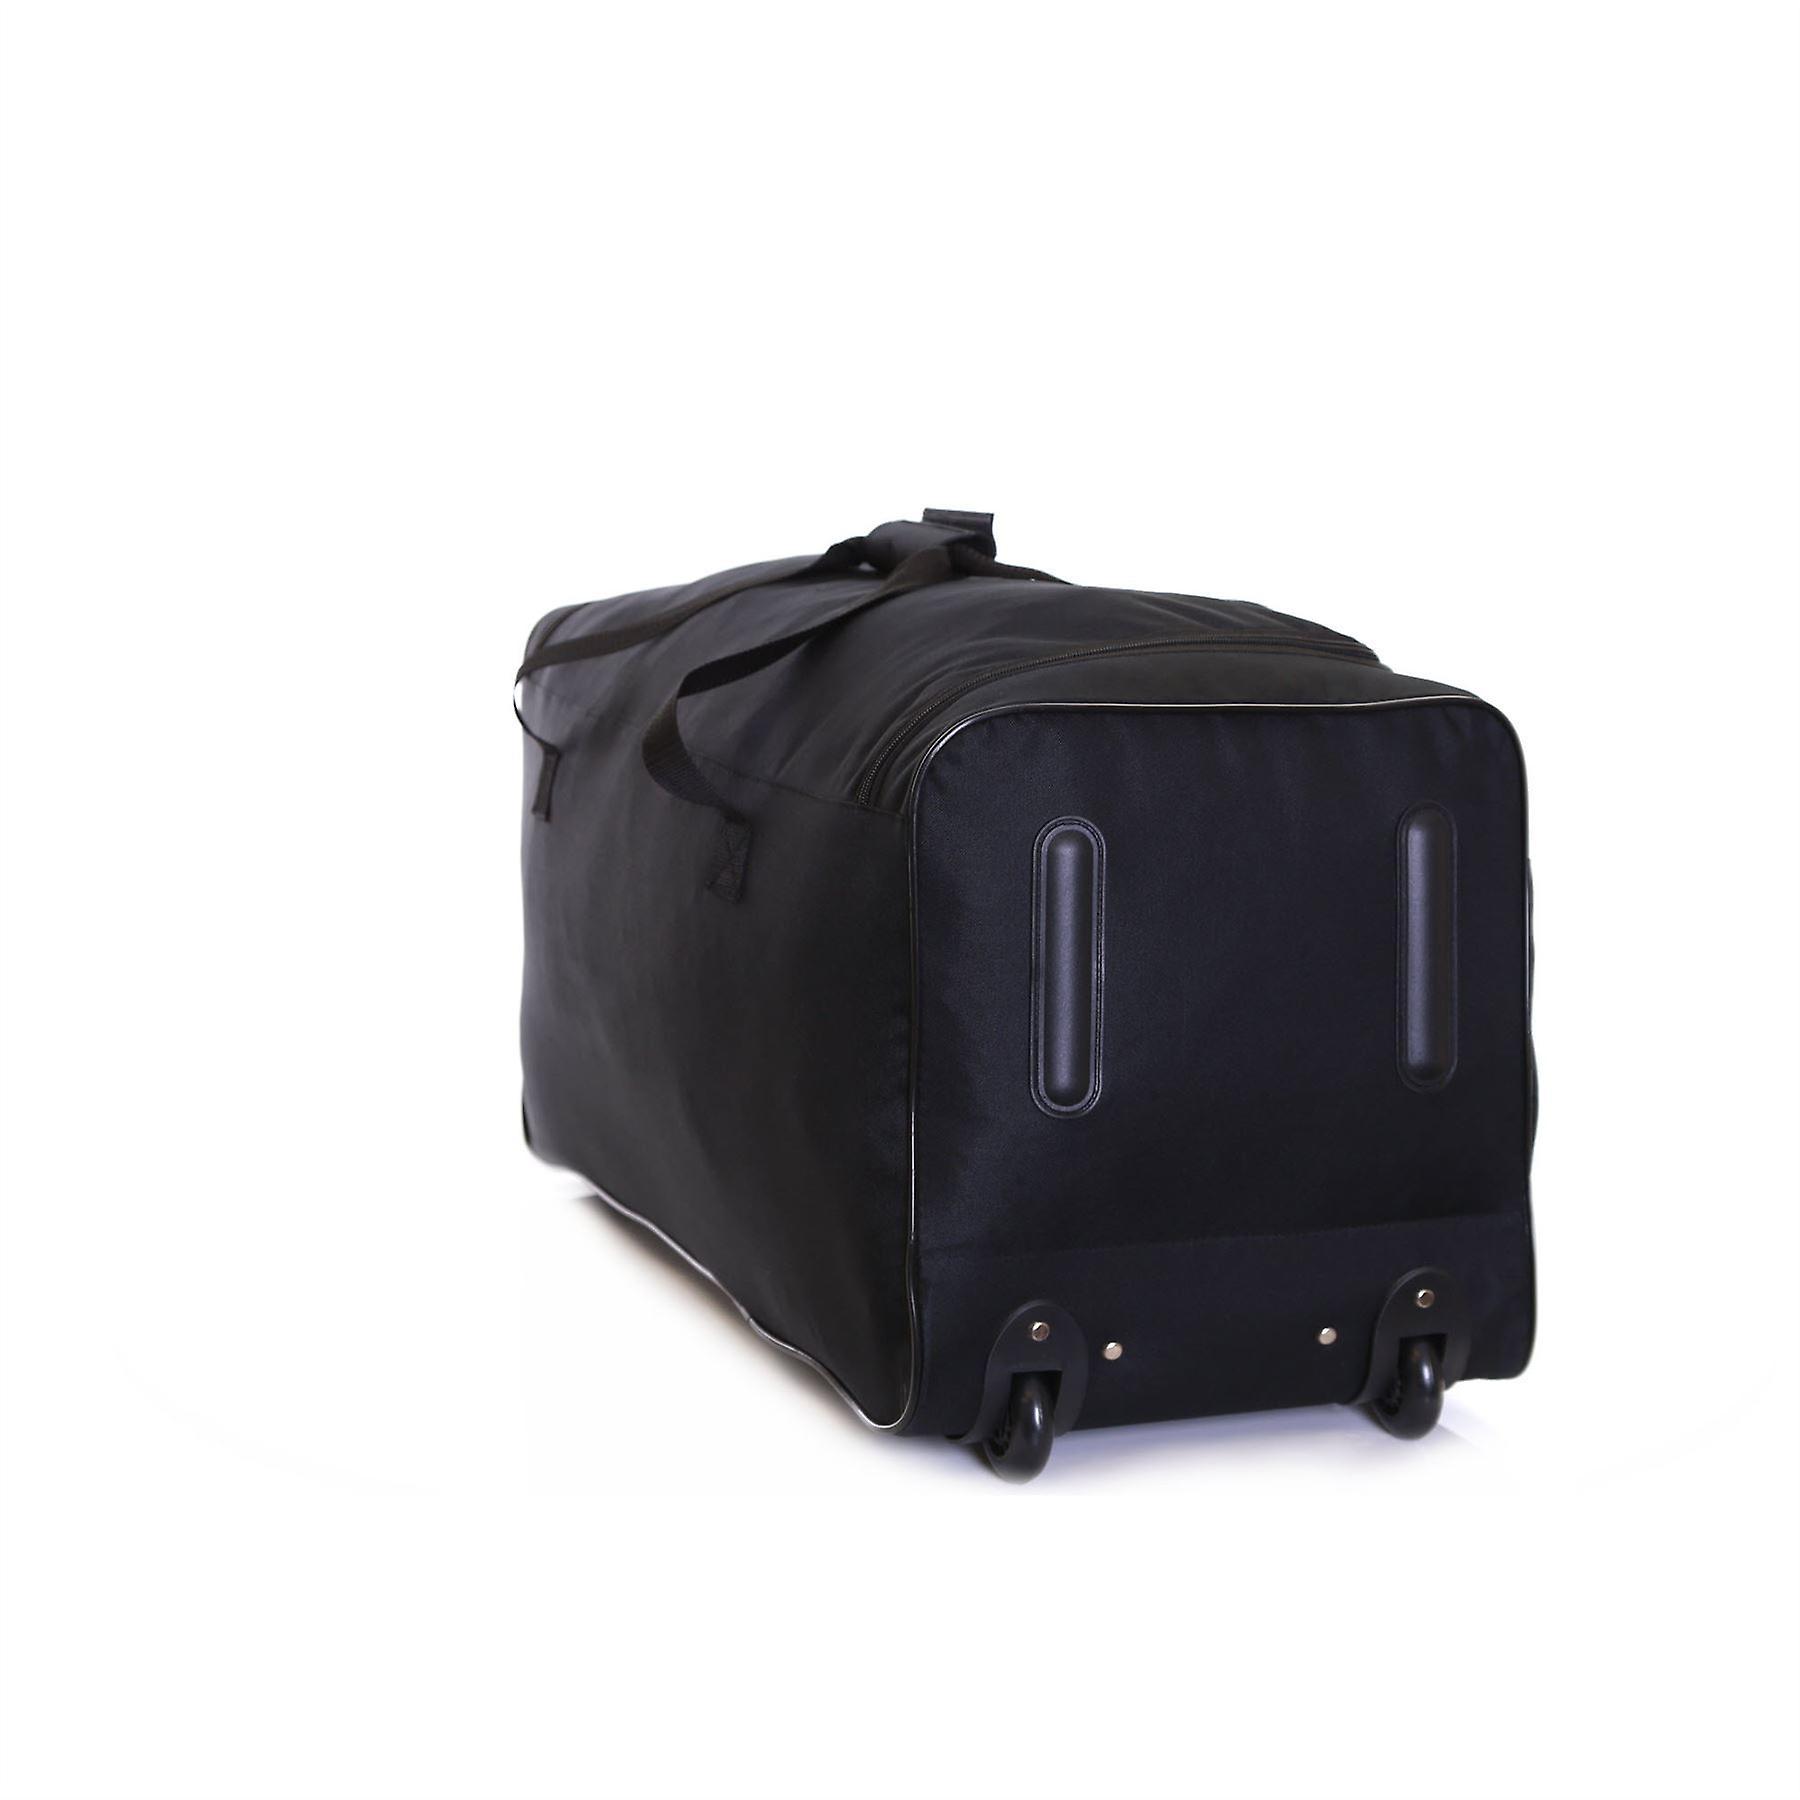 Slimbridge Braga 30 Inch Wheeled Bag, Black